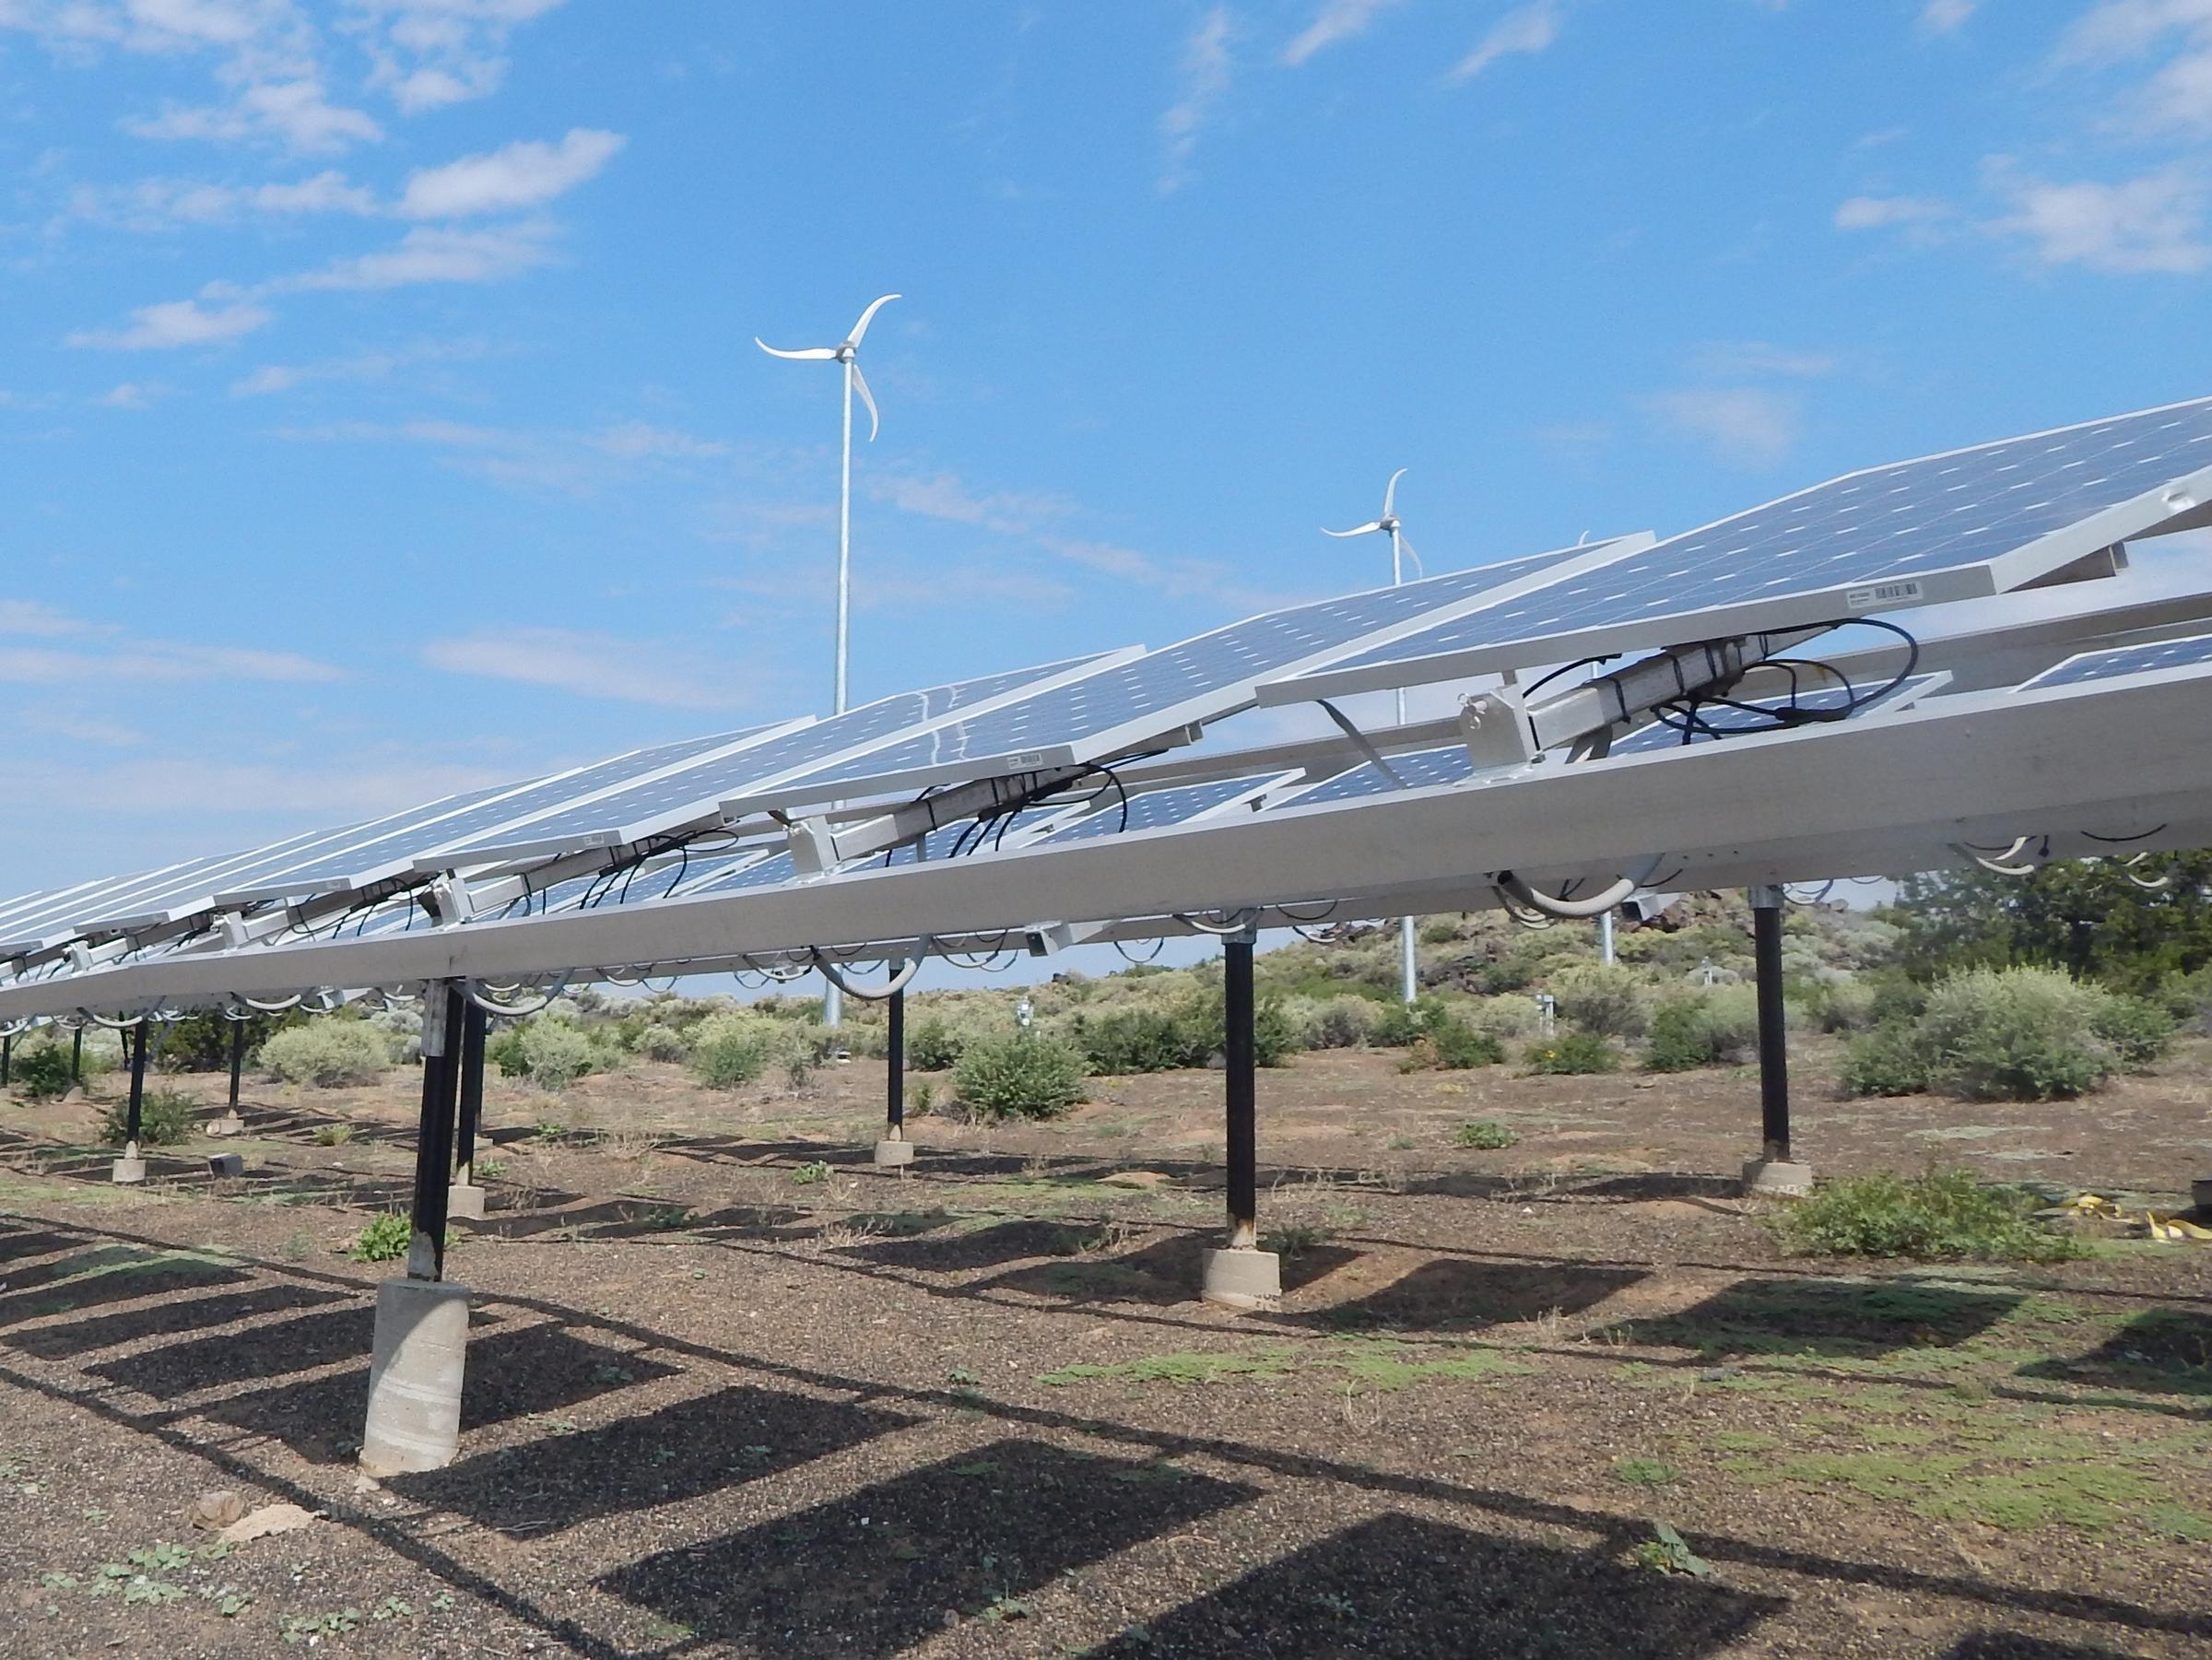 New solar panel tariffs will be felt by Arizona companies, consumers